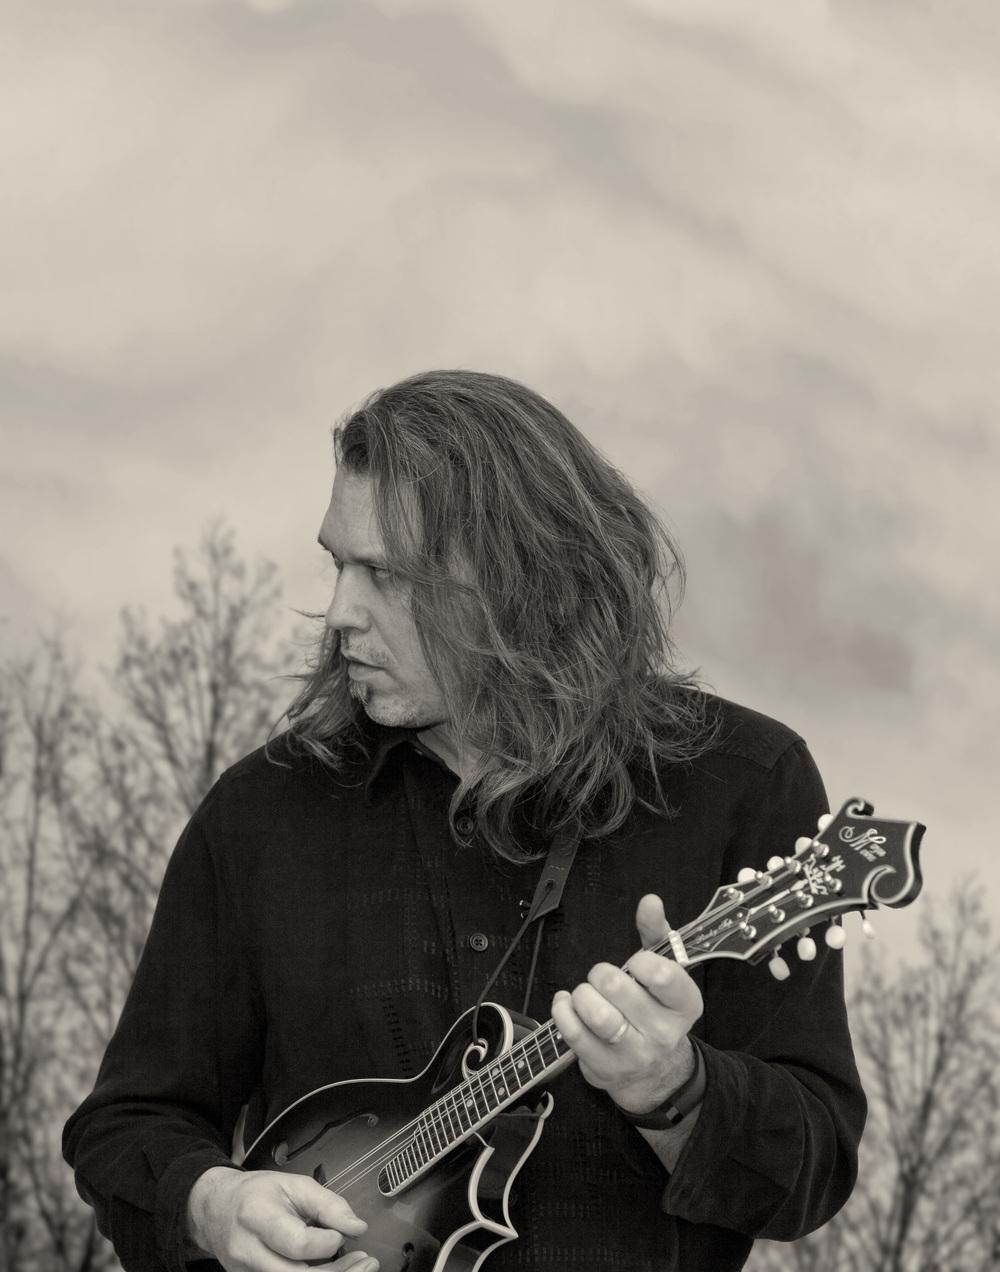 Marty Srayko